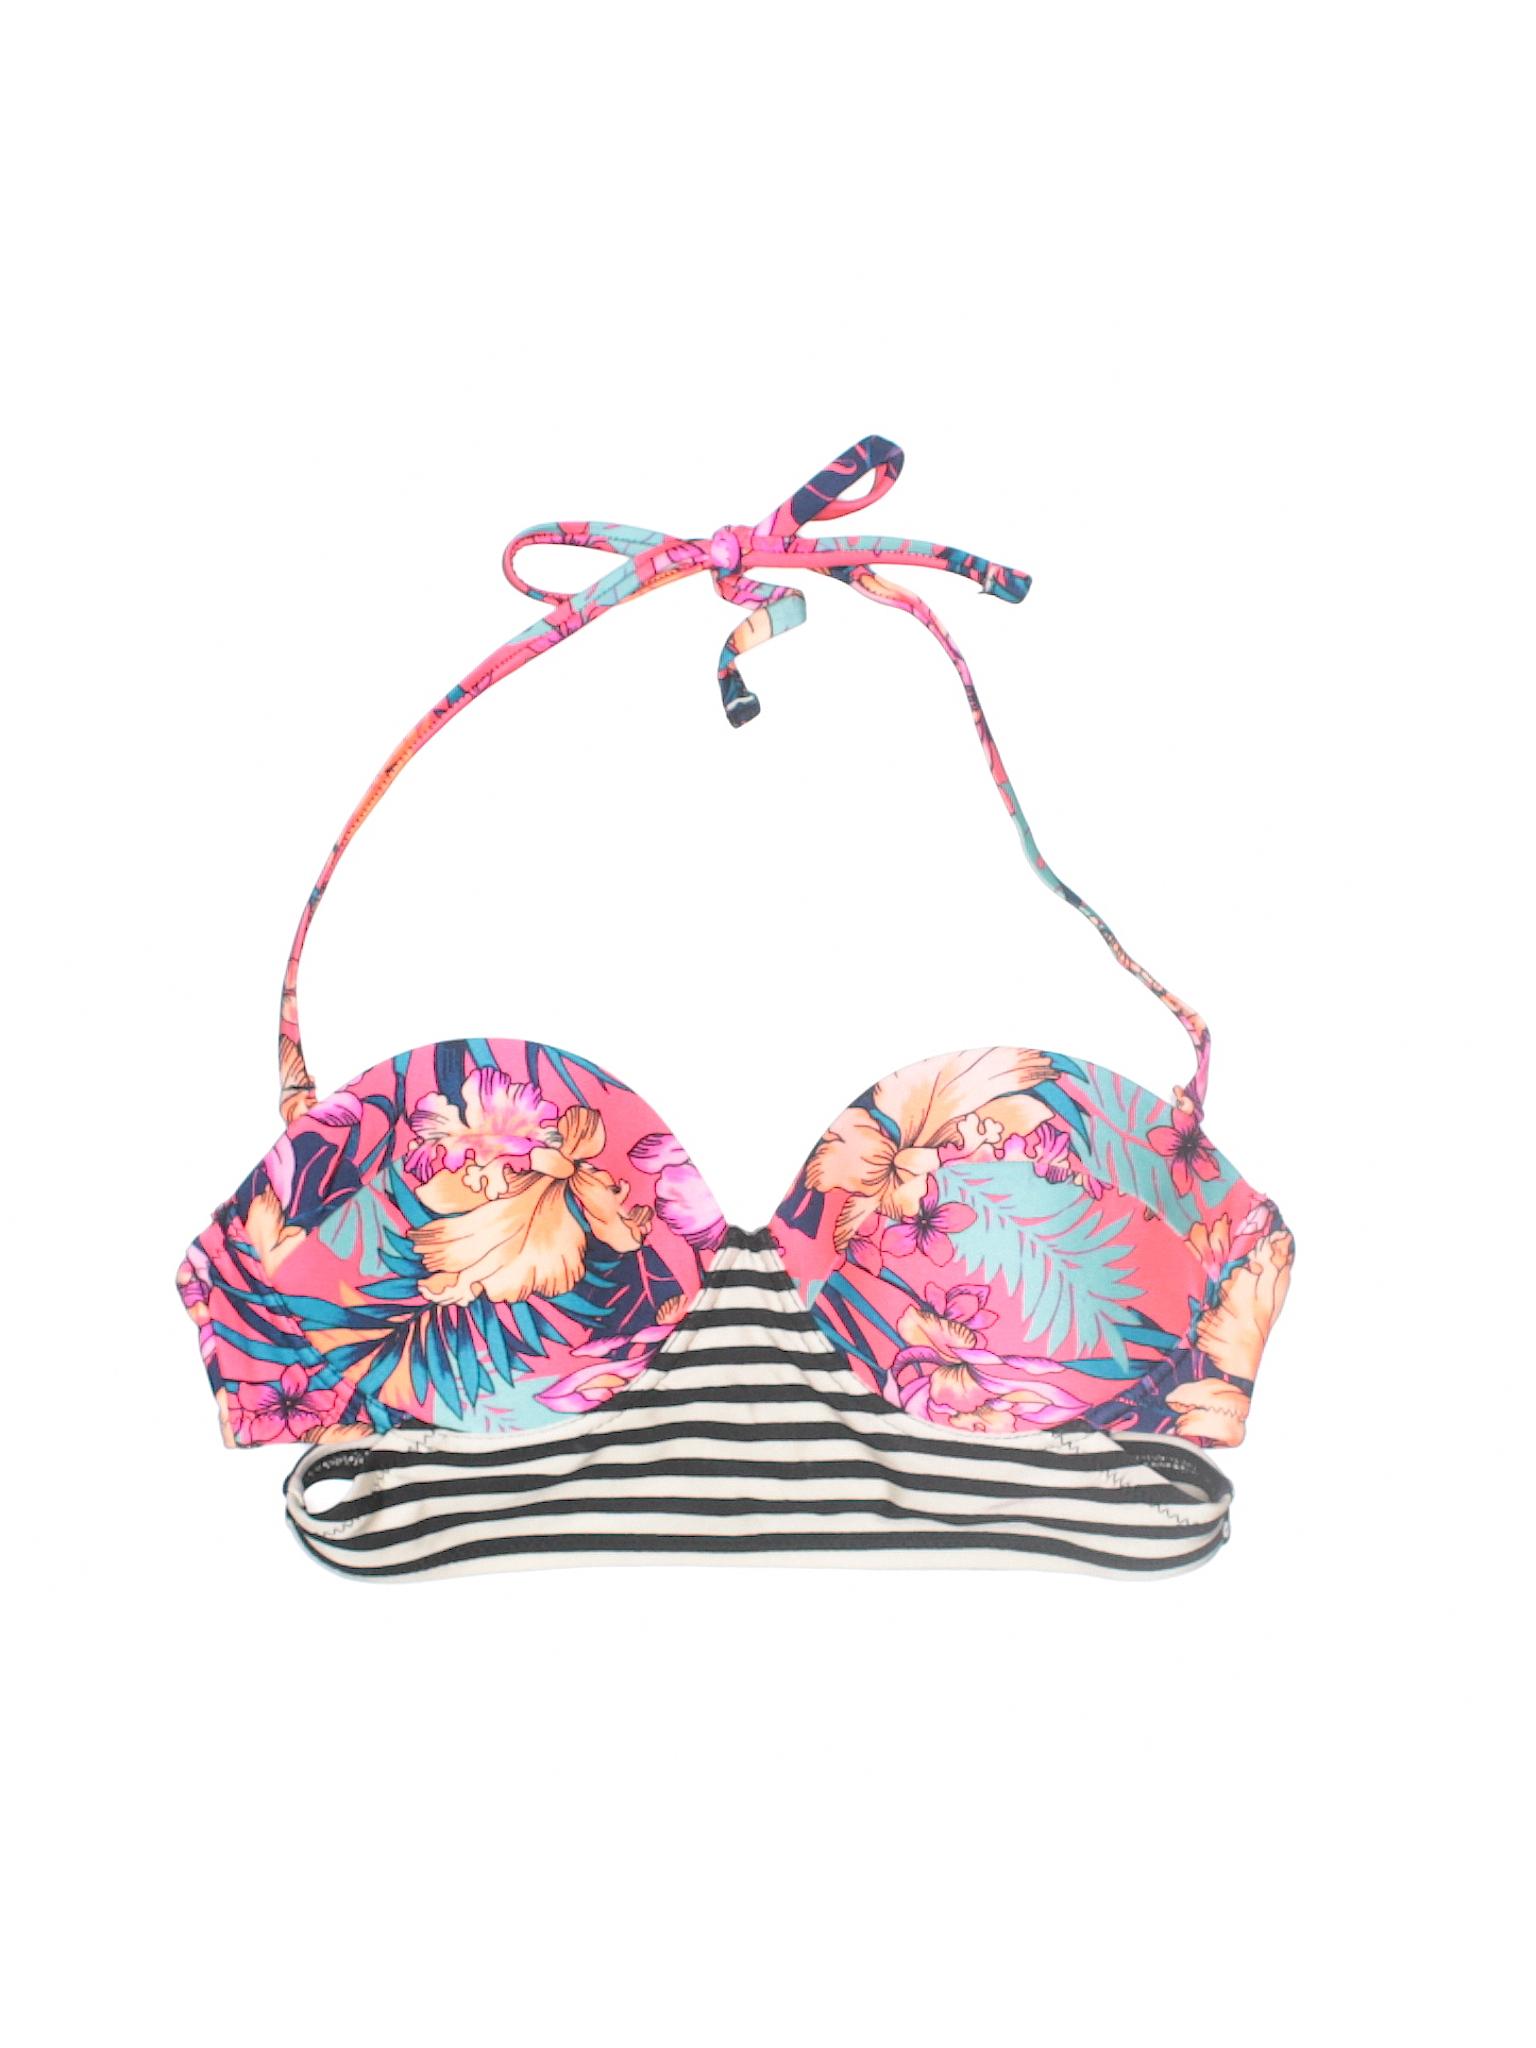 Swimsuit Swimsuit Swimsuit Boutique Boutique Boutique Xhilaration Top Swimsuit Boutique Top Xhilaration Xhilaration Top Xhilaration d5wAXd